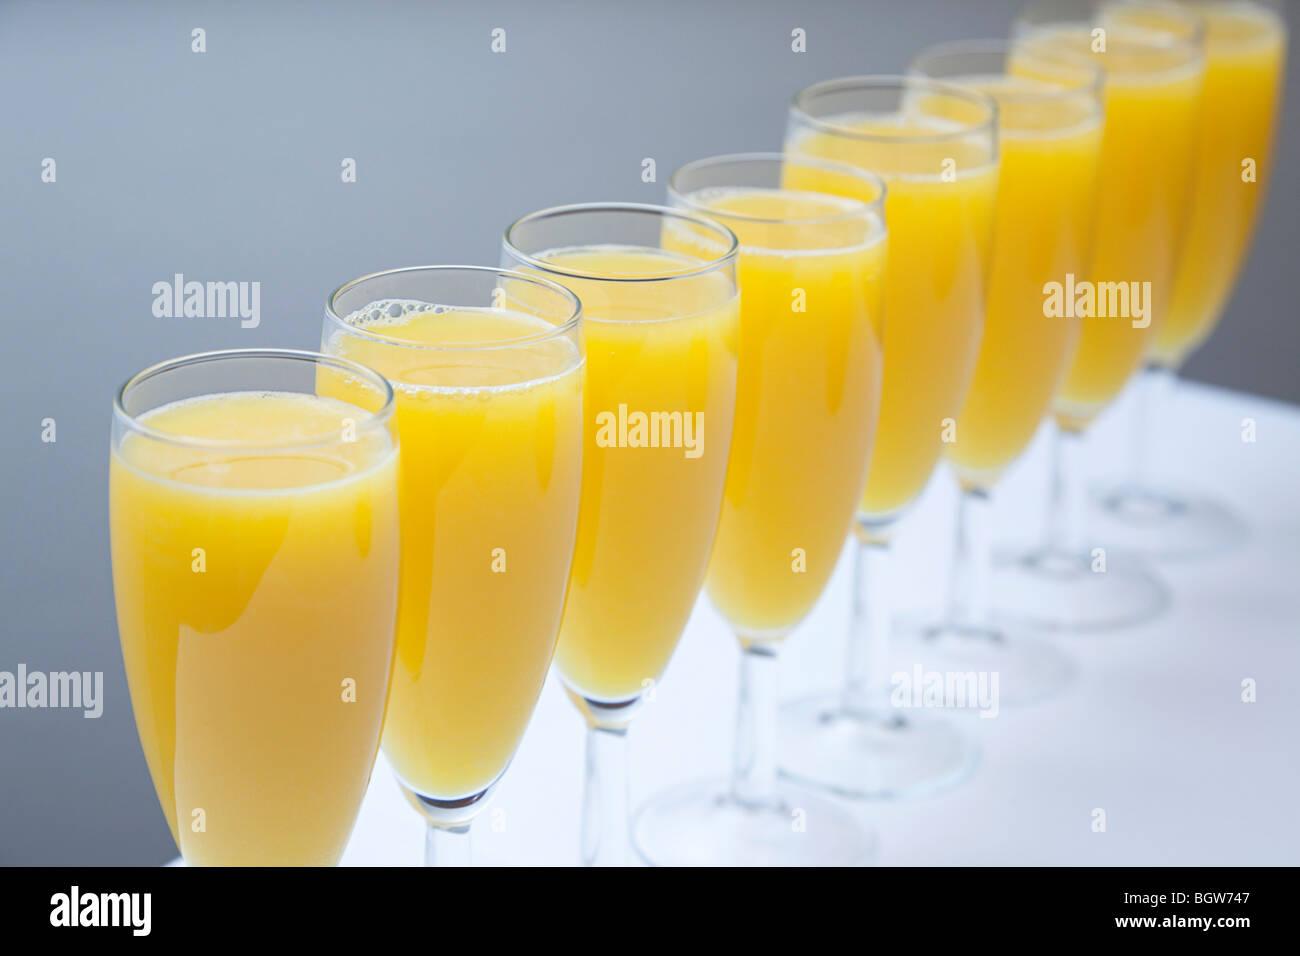 bucks fizz drink - Stock Image